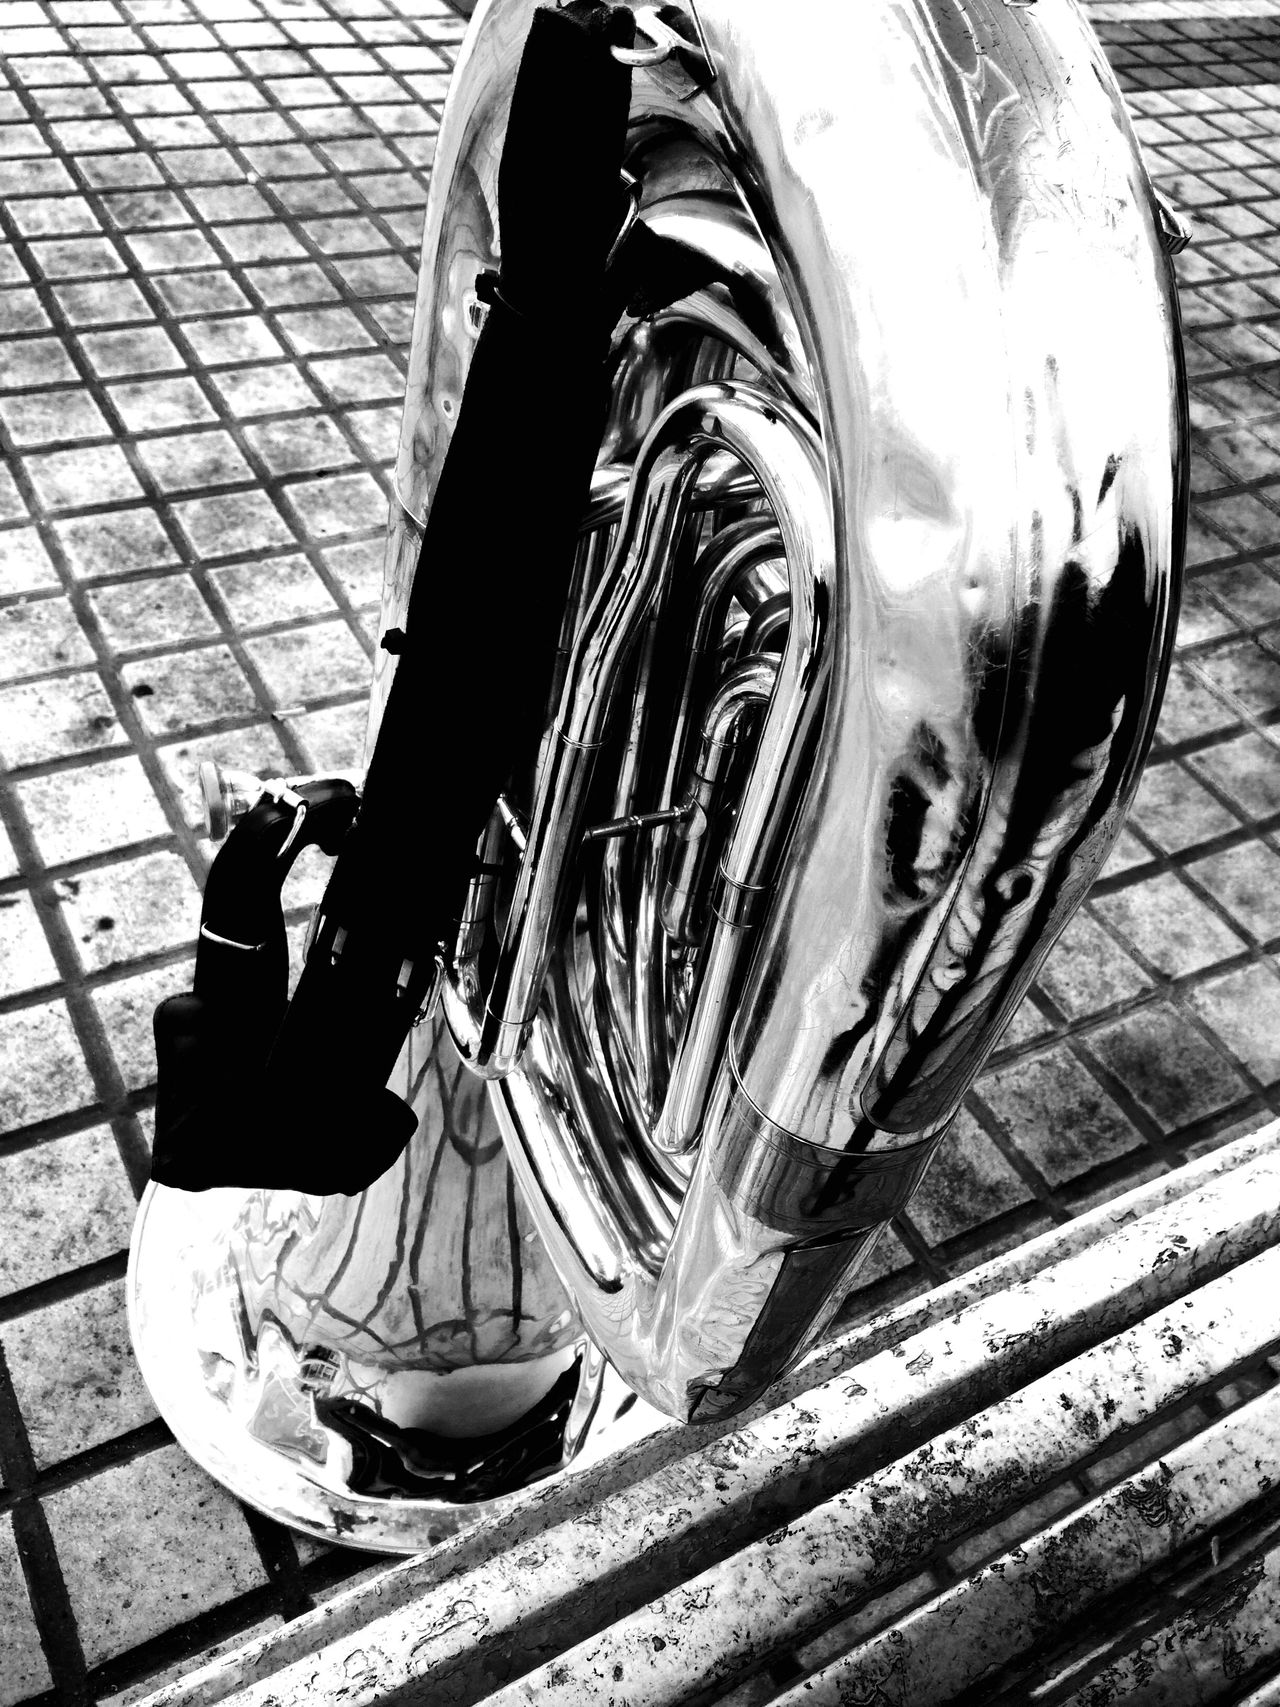 Instruments Metallic Blackandwhite Black & White Black And White Photography Beautiful Instrument Tuba EyeEmNewHere